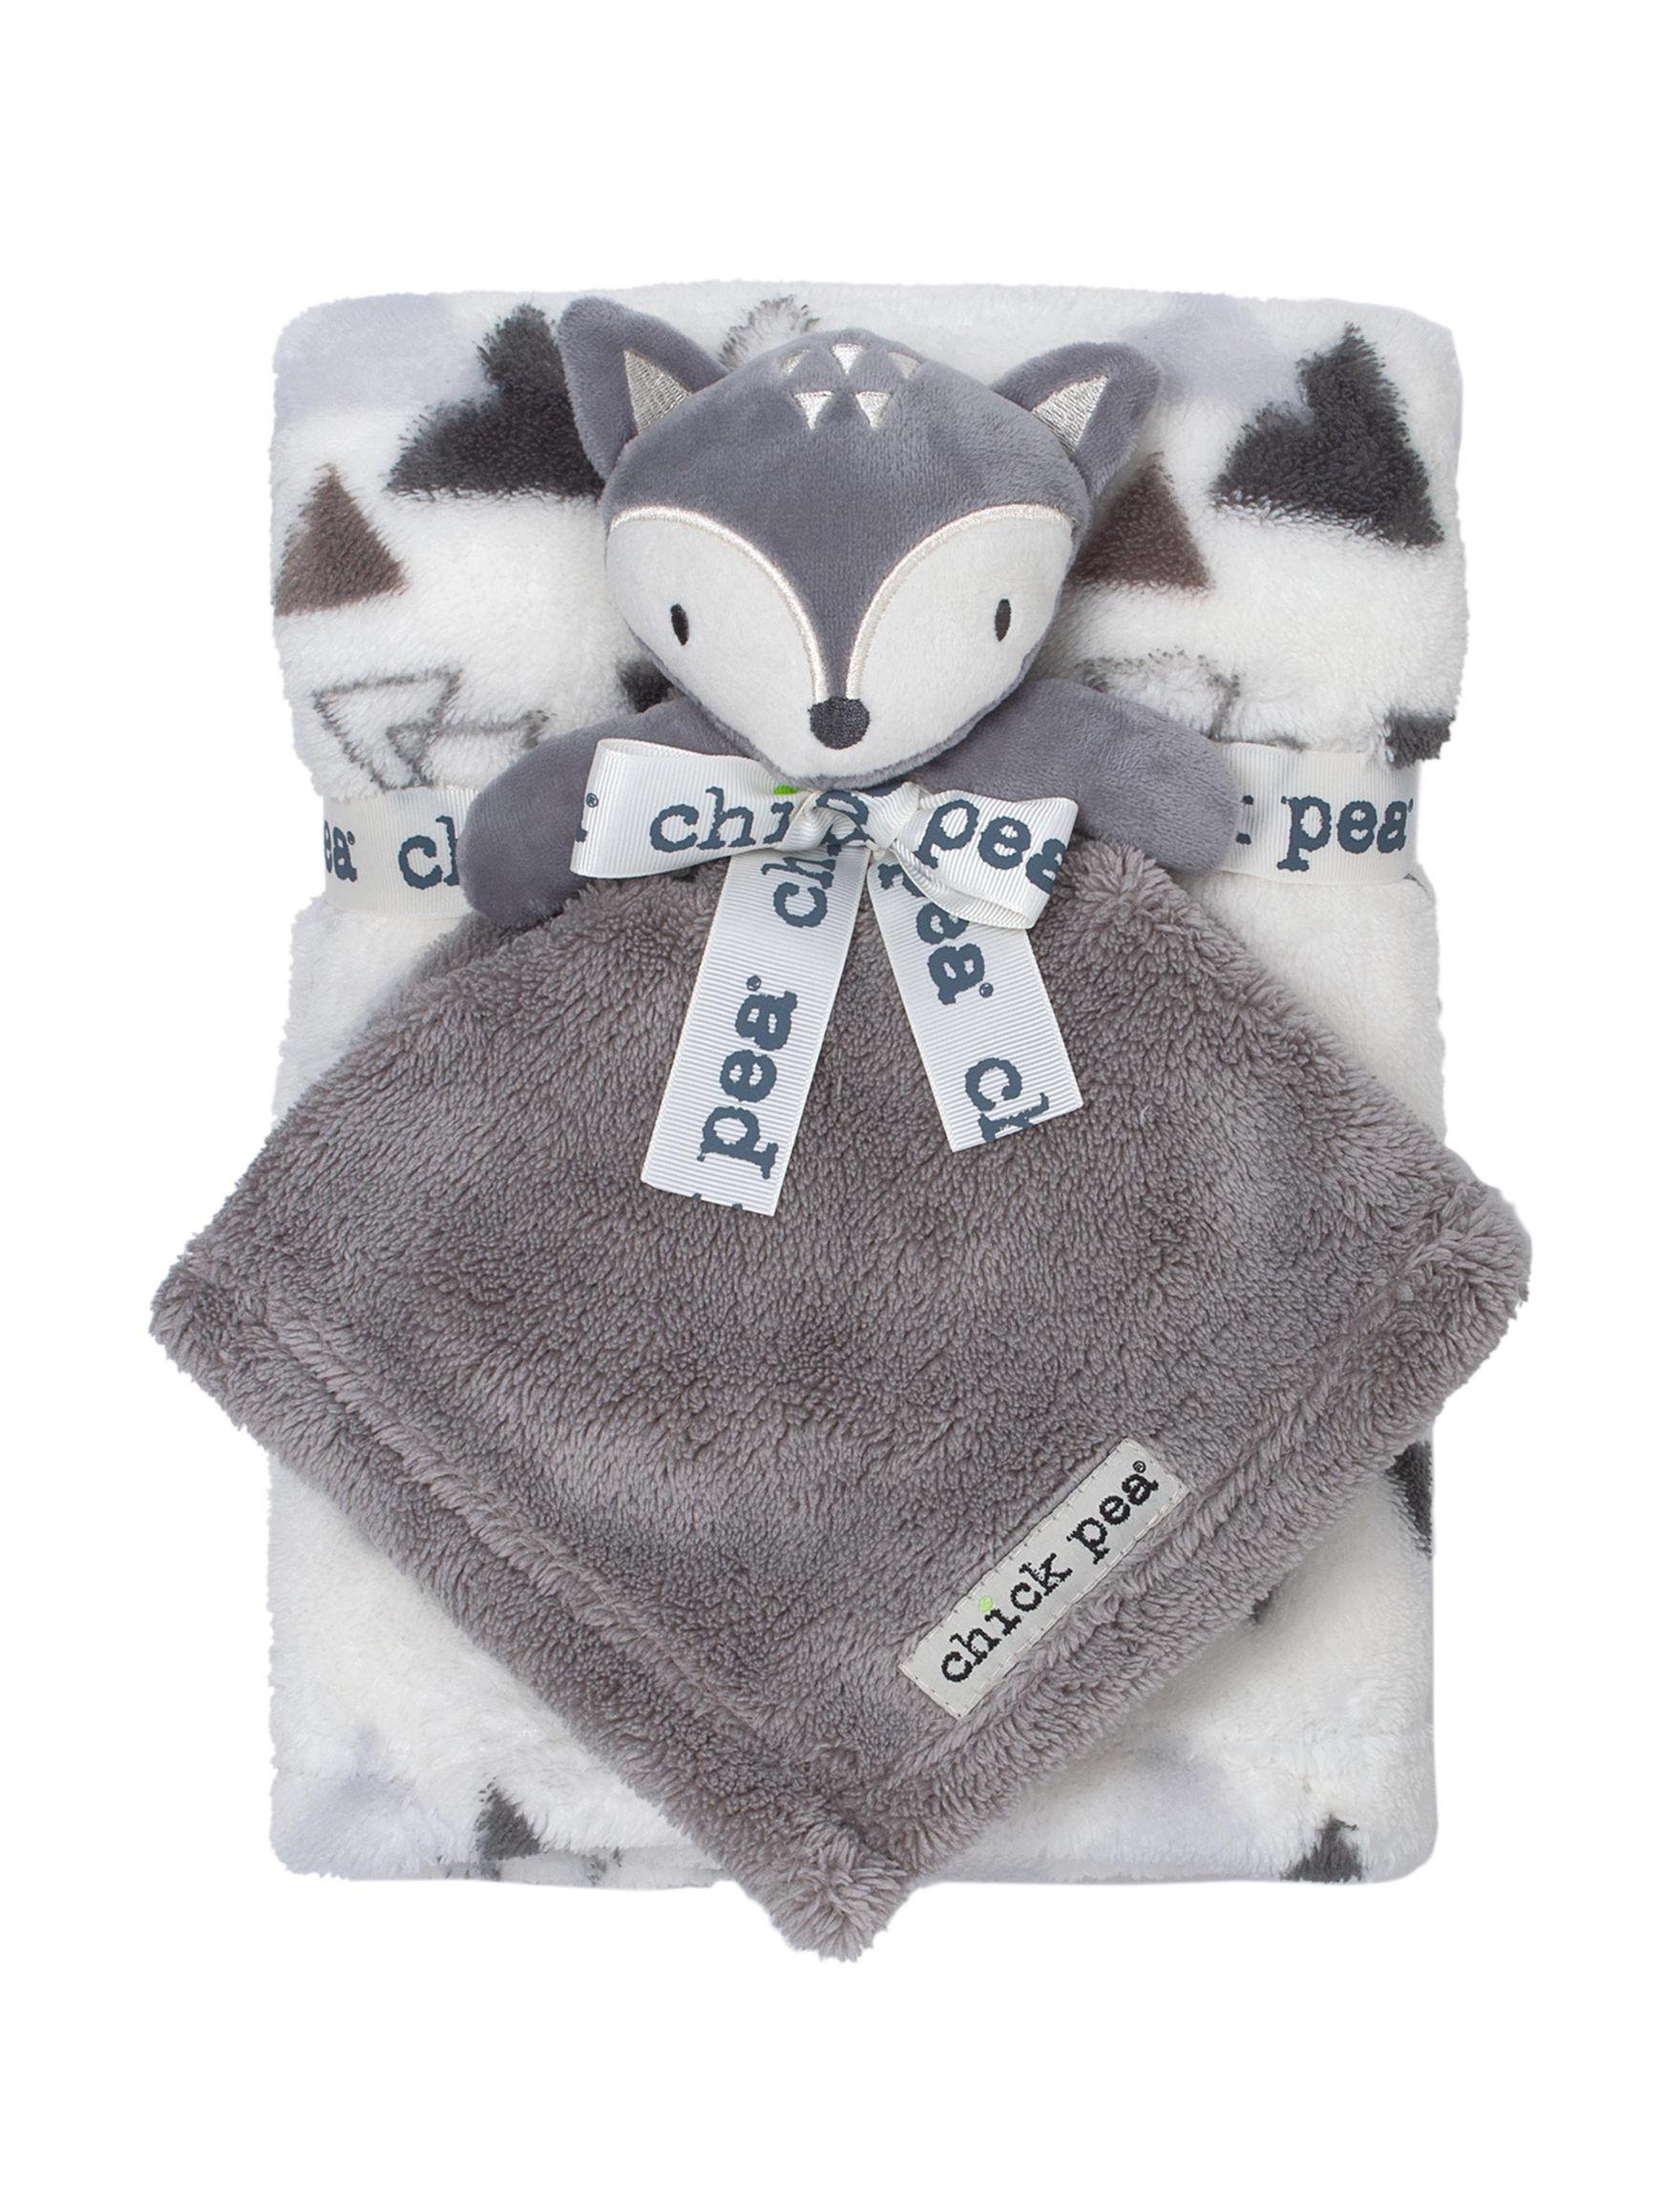 Cutie Pie Grey